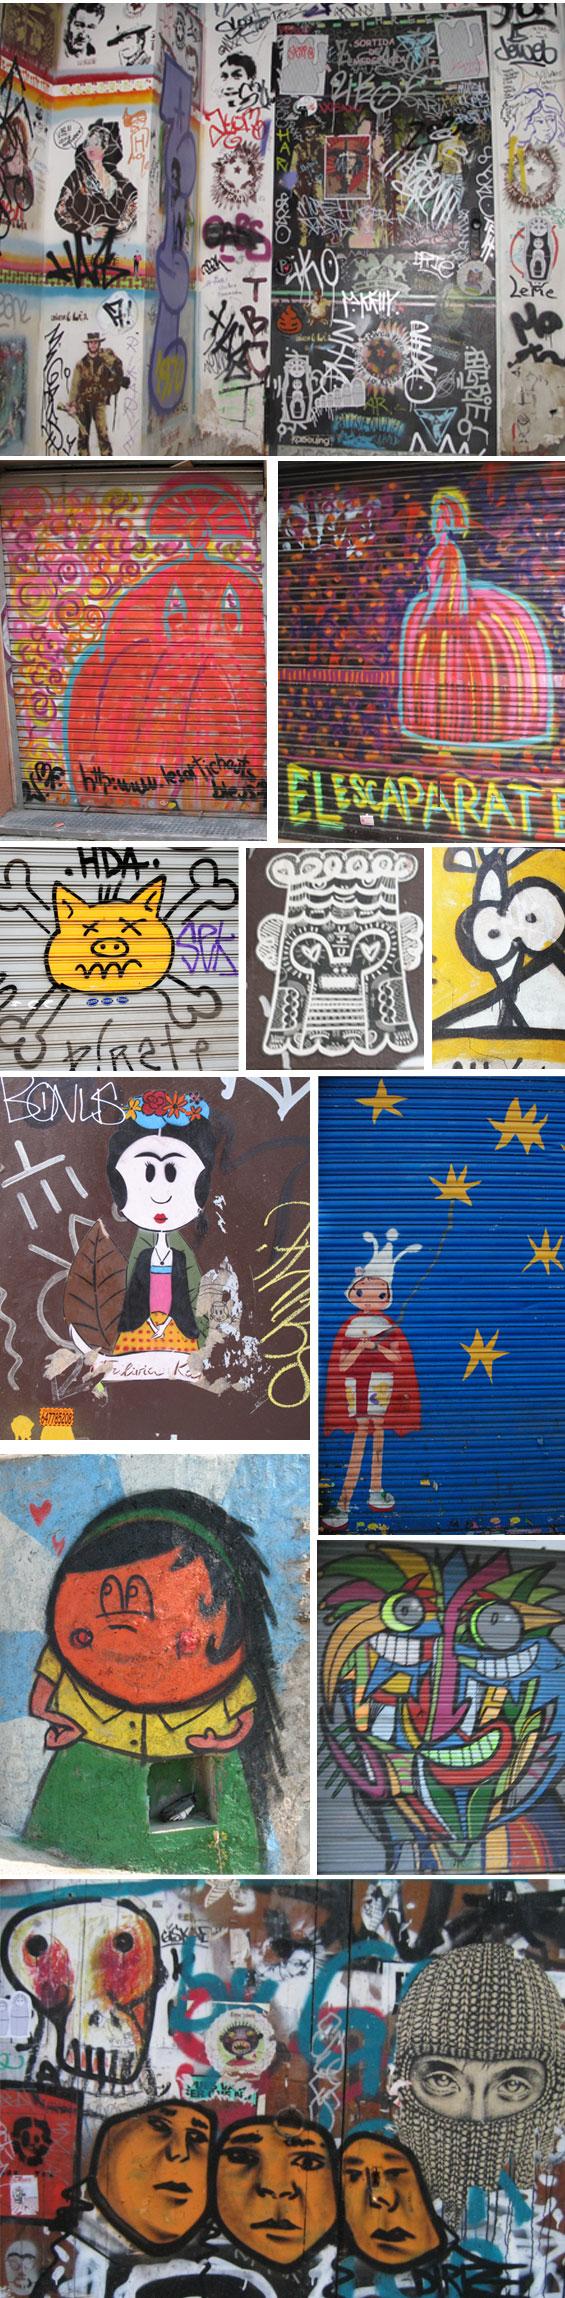 barcelona spain graffiti and street art